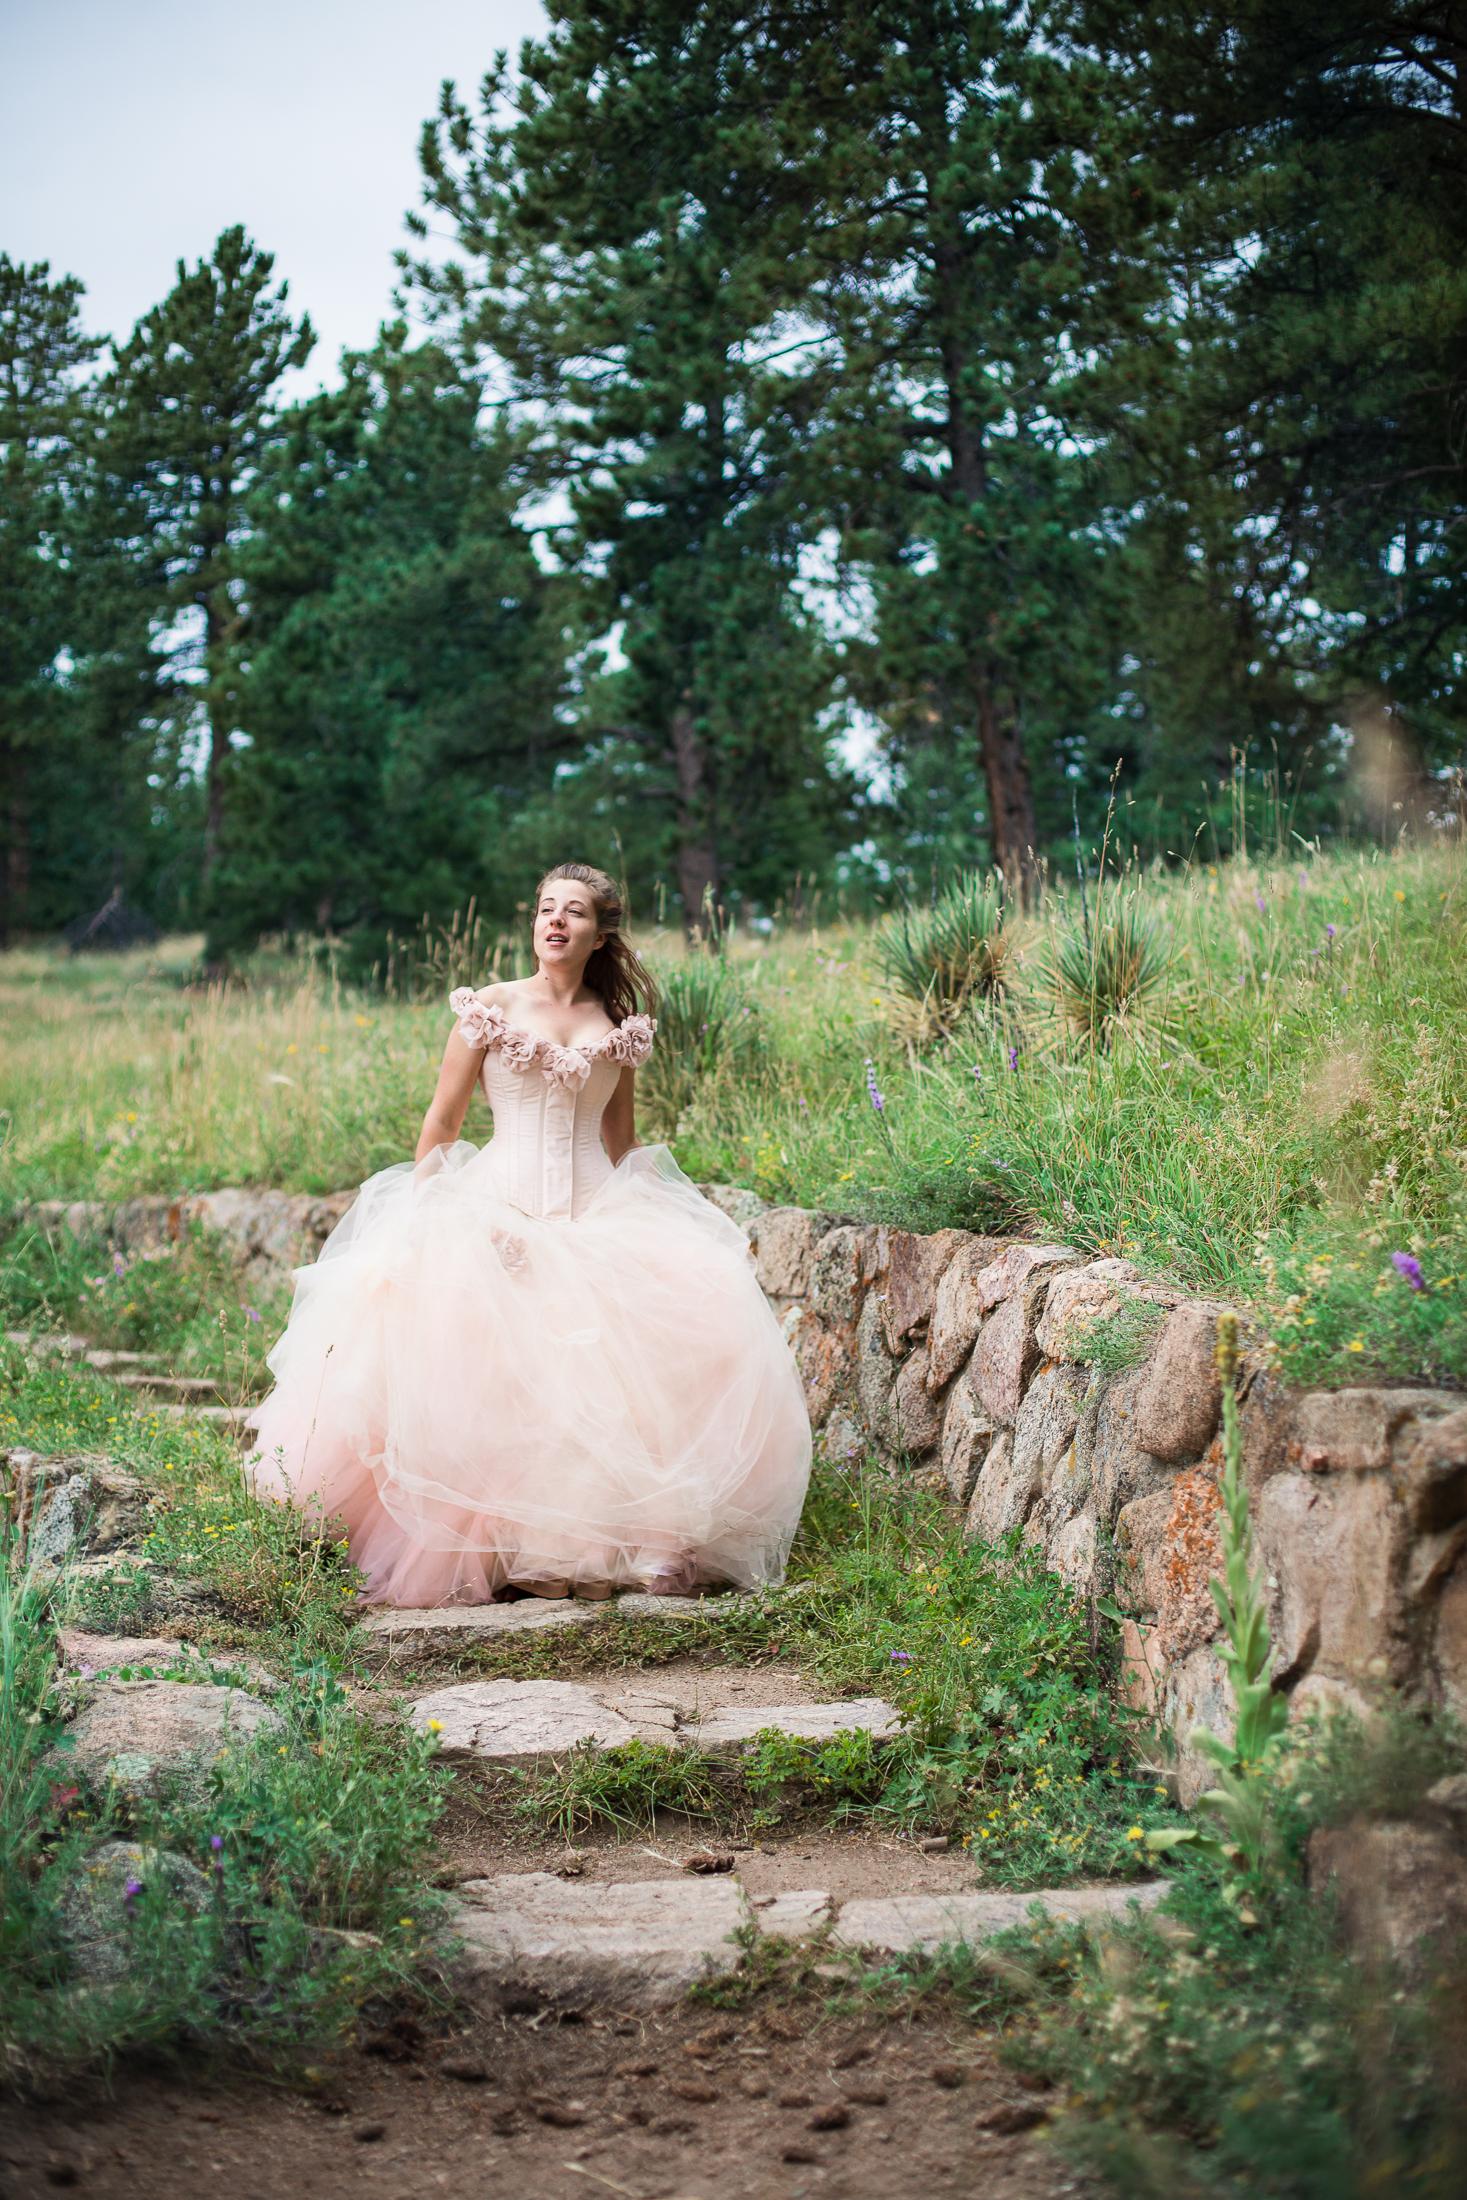 Jen_Montgomery_Photography_MN_sarahdressCO-10.jpg